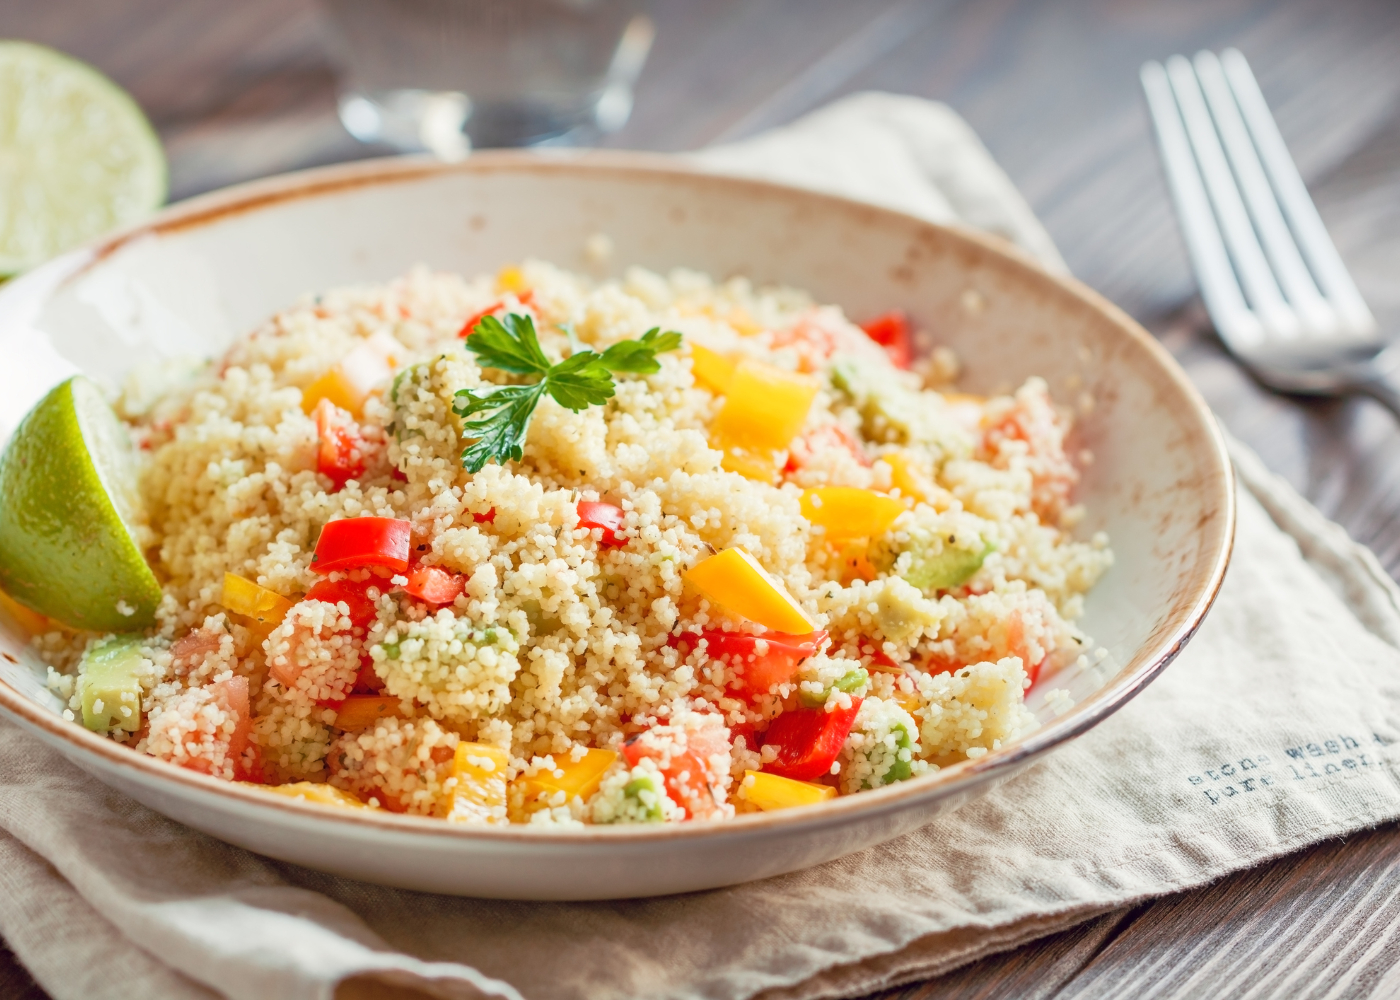 receitas saudaveis de couscous: leves e saborosas